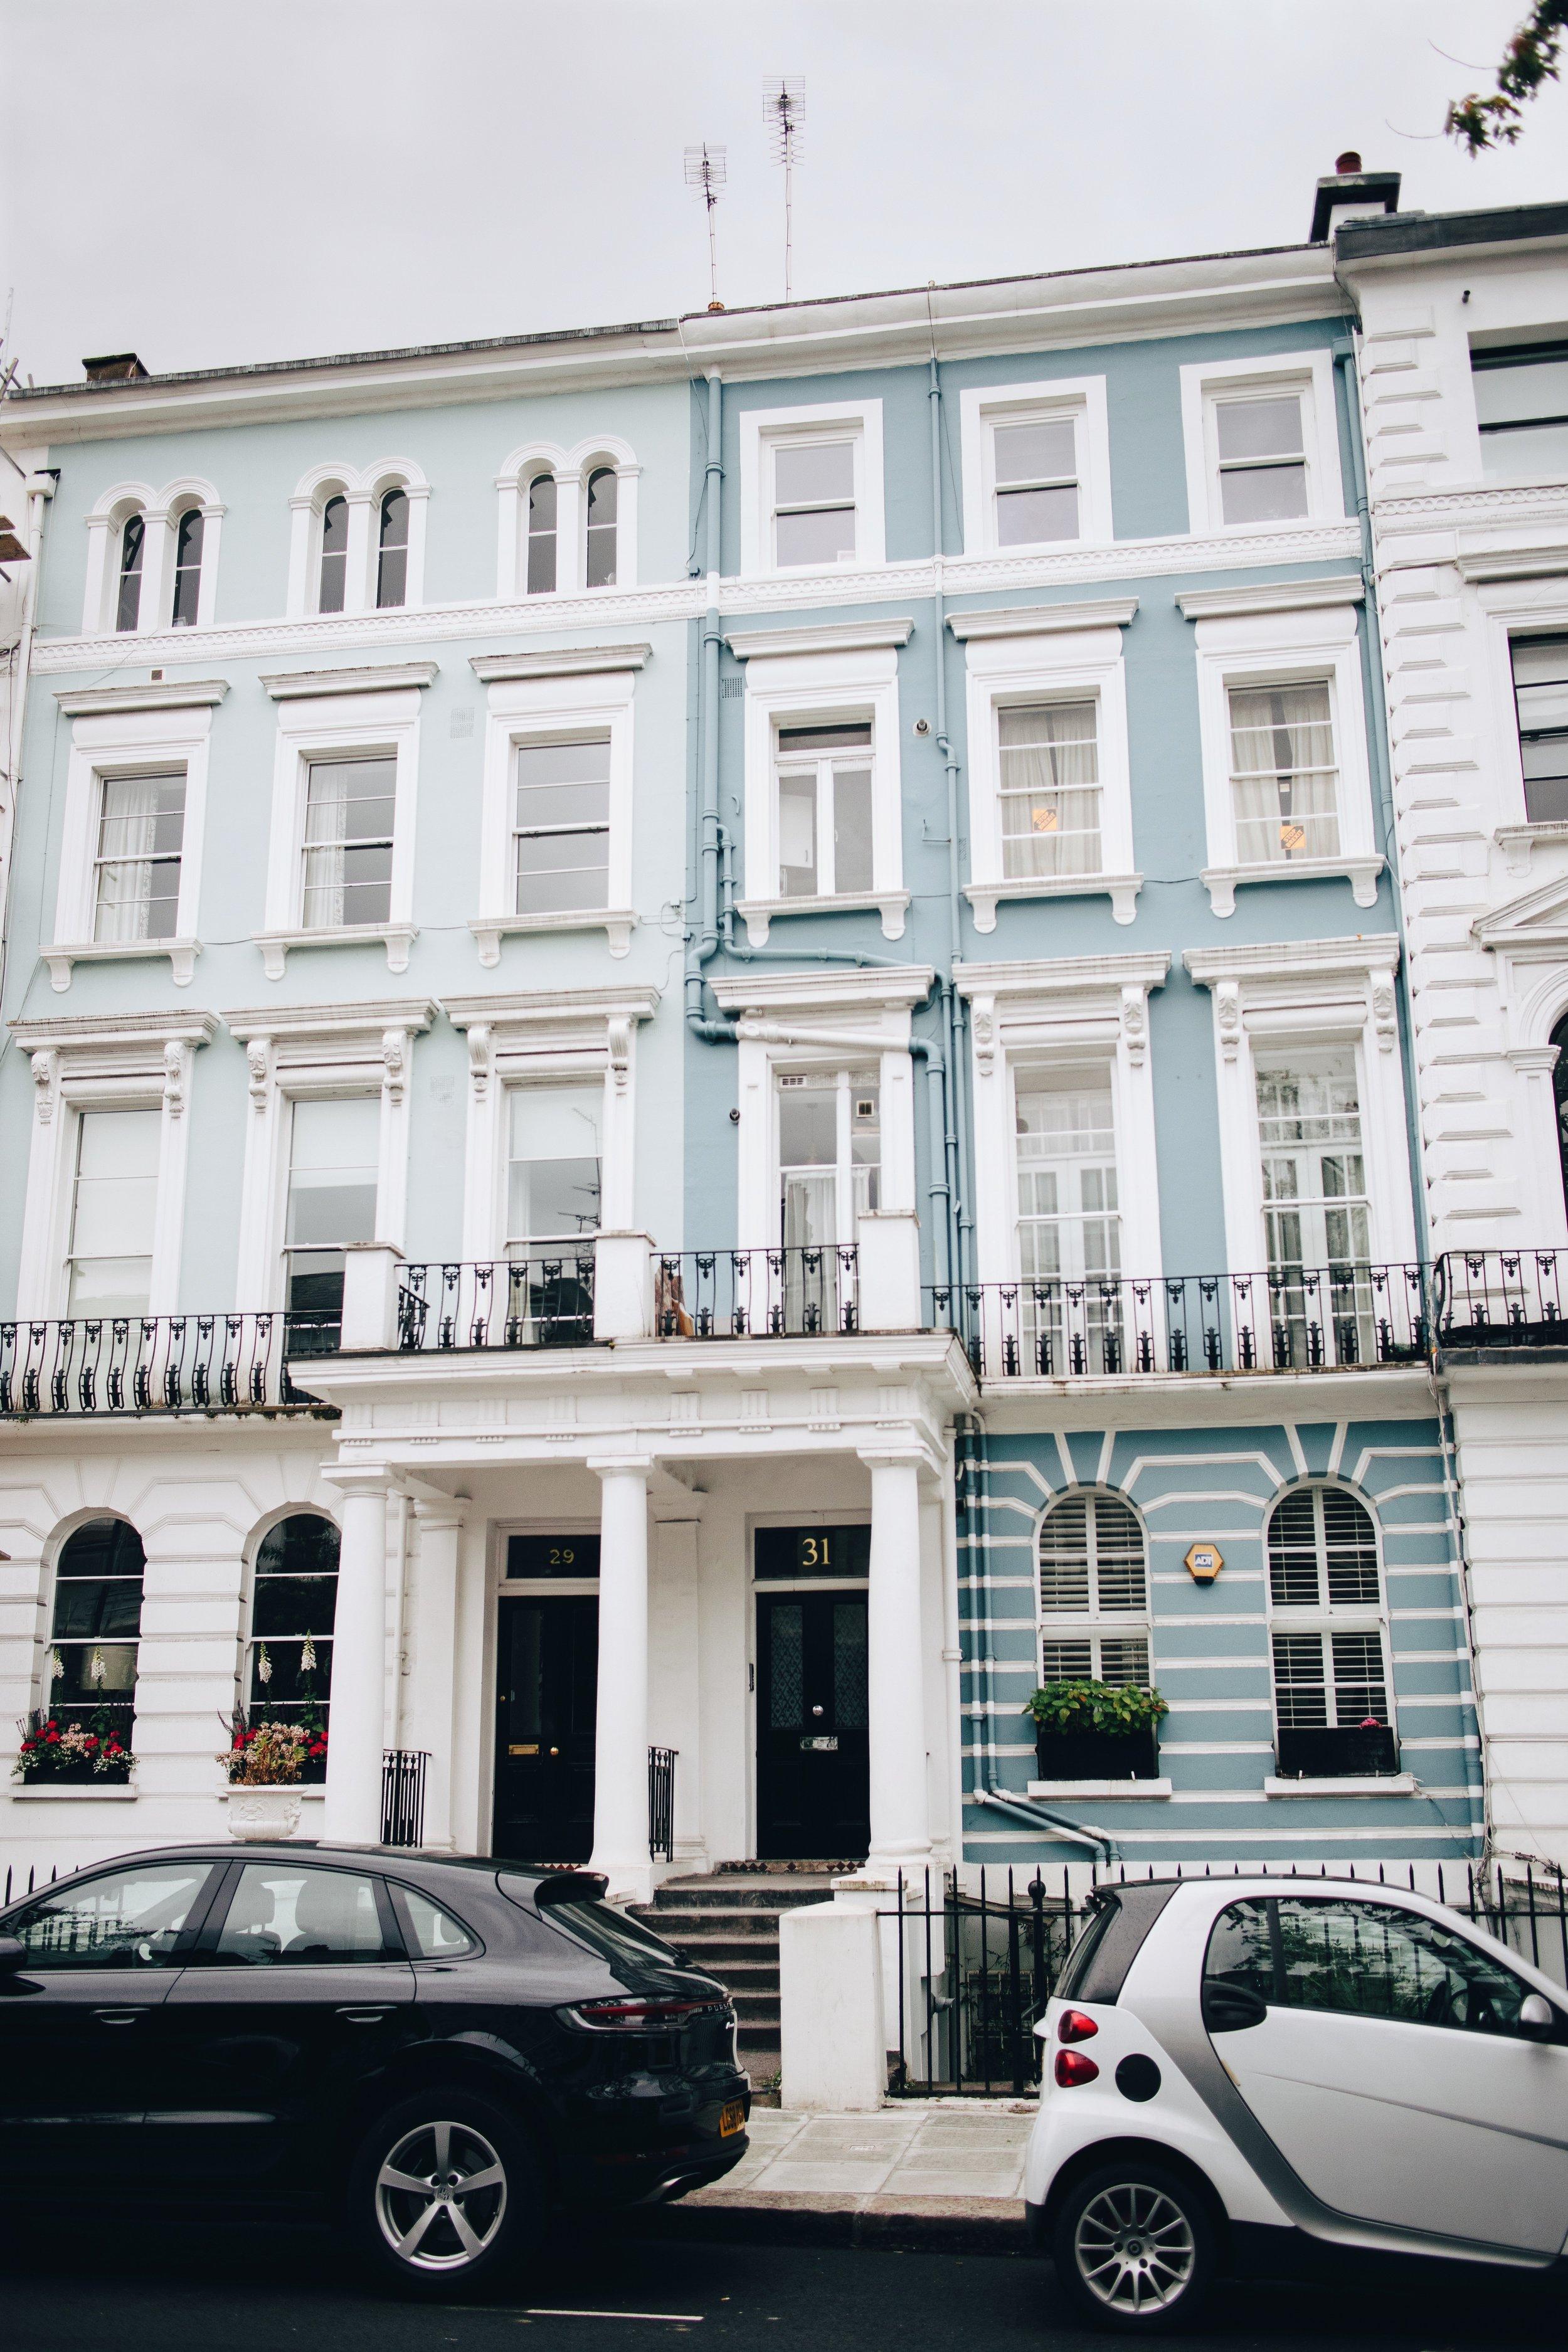 london-travel-diary-6.JPG